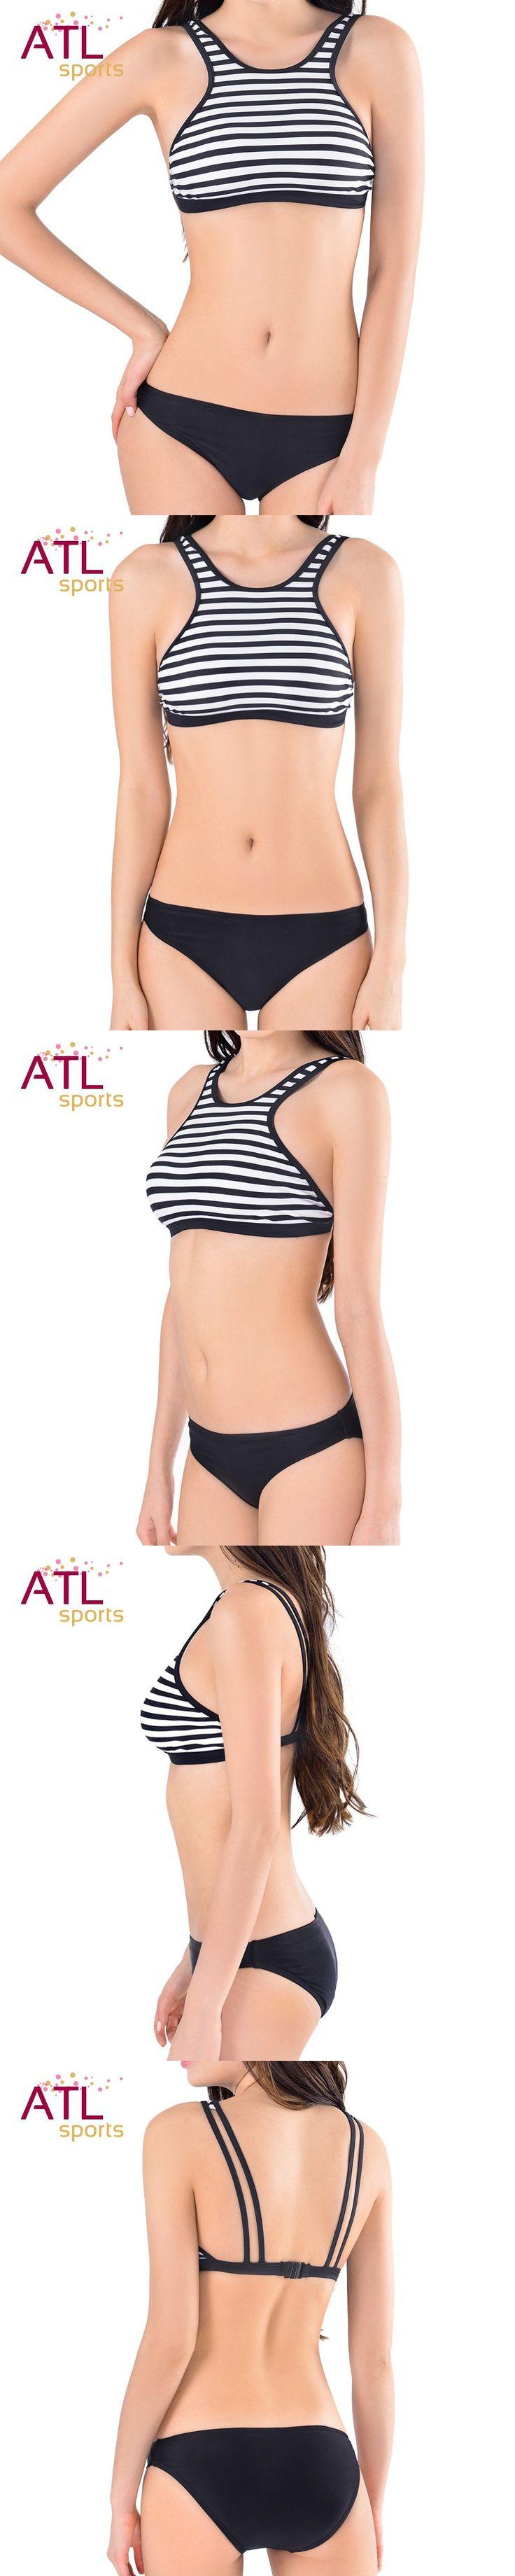 Tankini Bikini Set Swimsuits Women High Neck Swimsuit Two Piece Swimwear 2016 Summer Bikini Black And White Stripes Bathing Suit $24.96